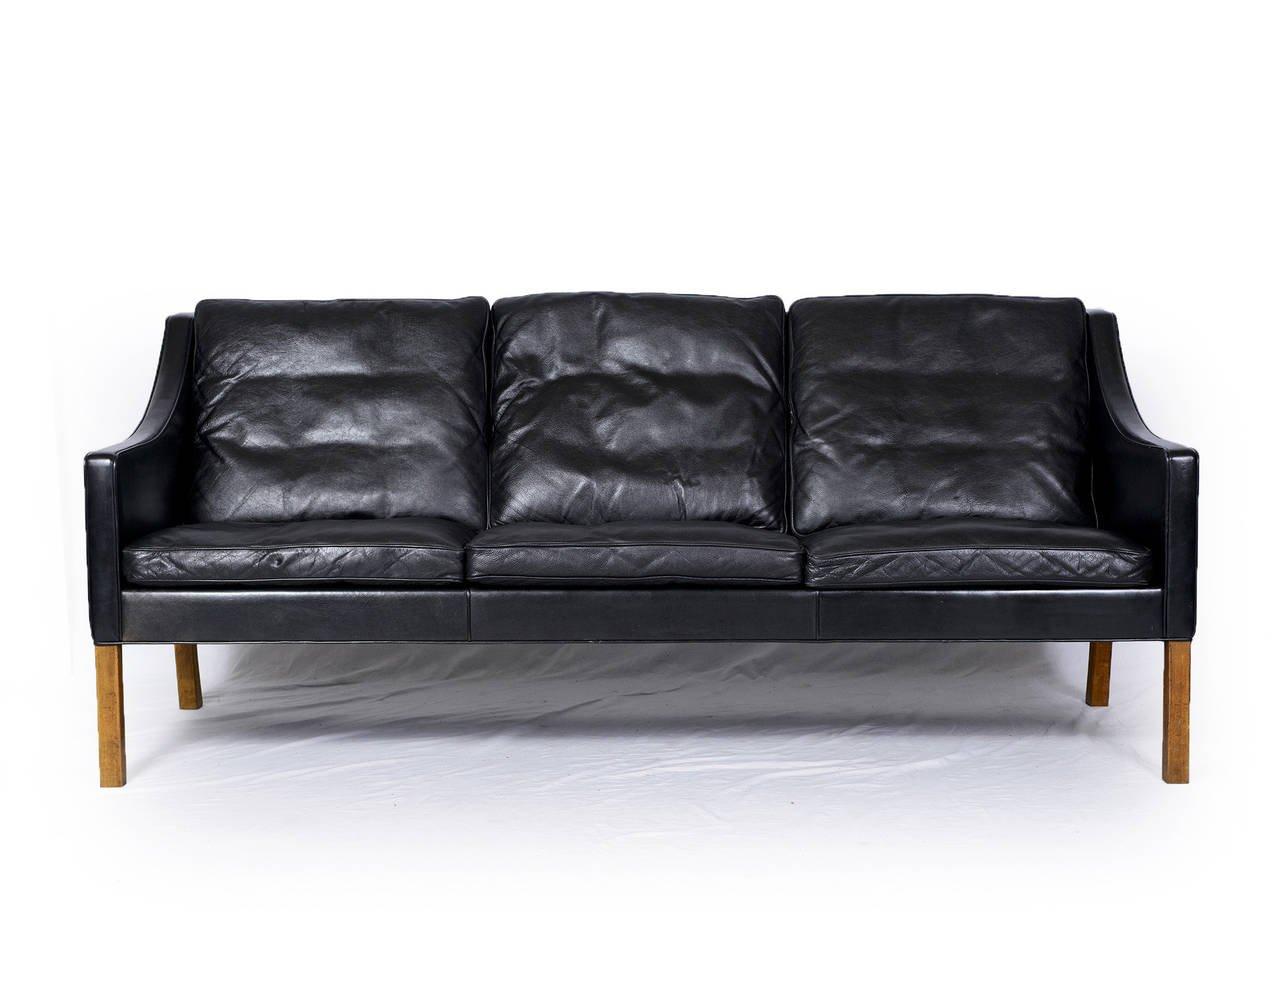 Klassiker Model 2209 Skandinaviskdesign Dk